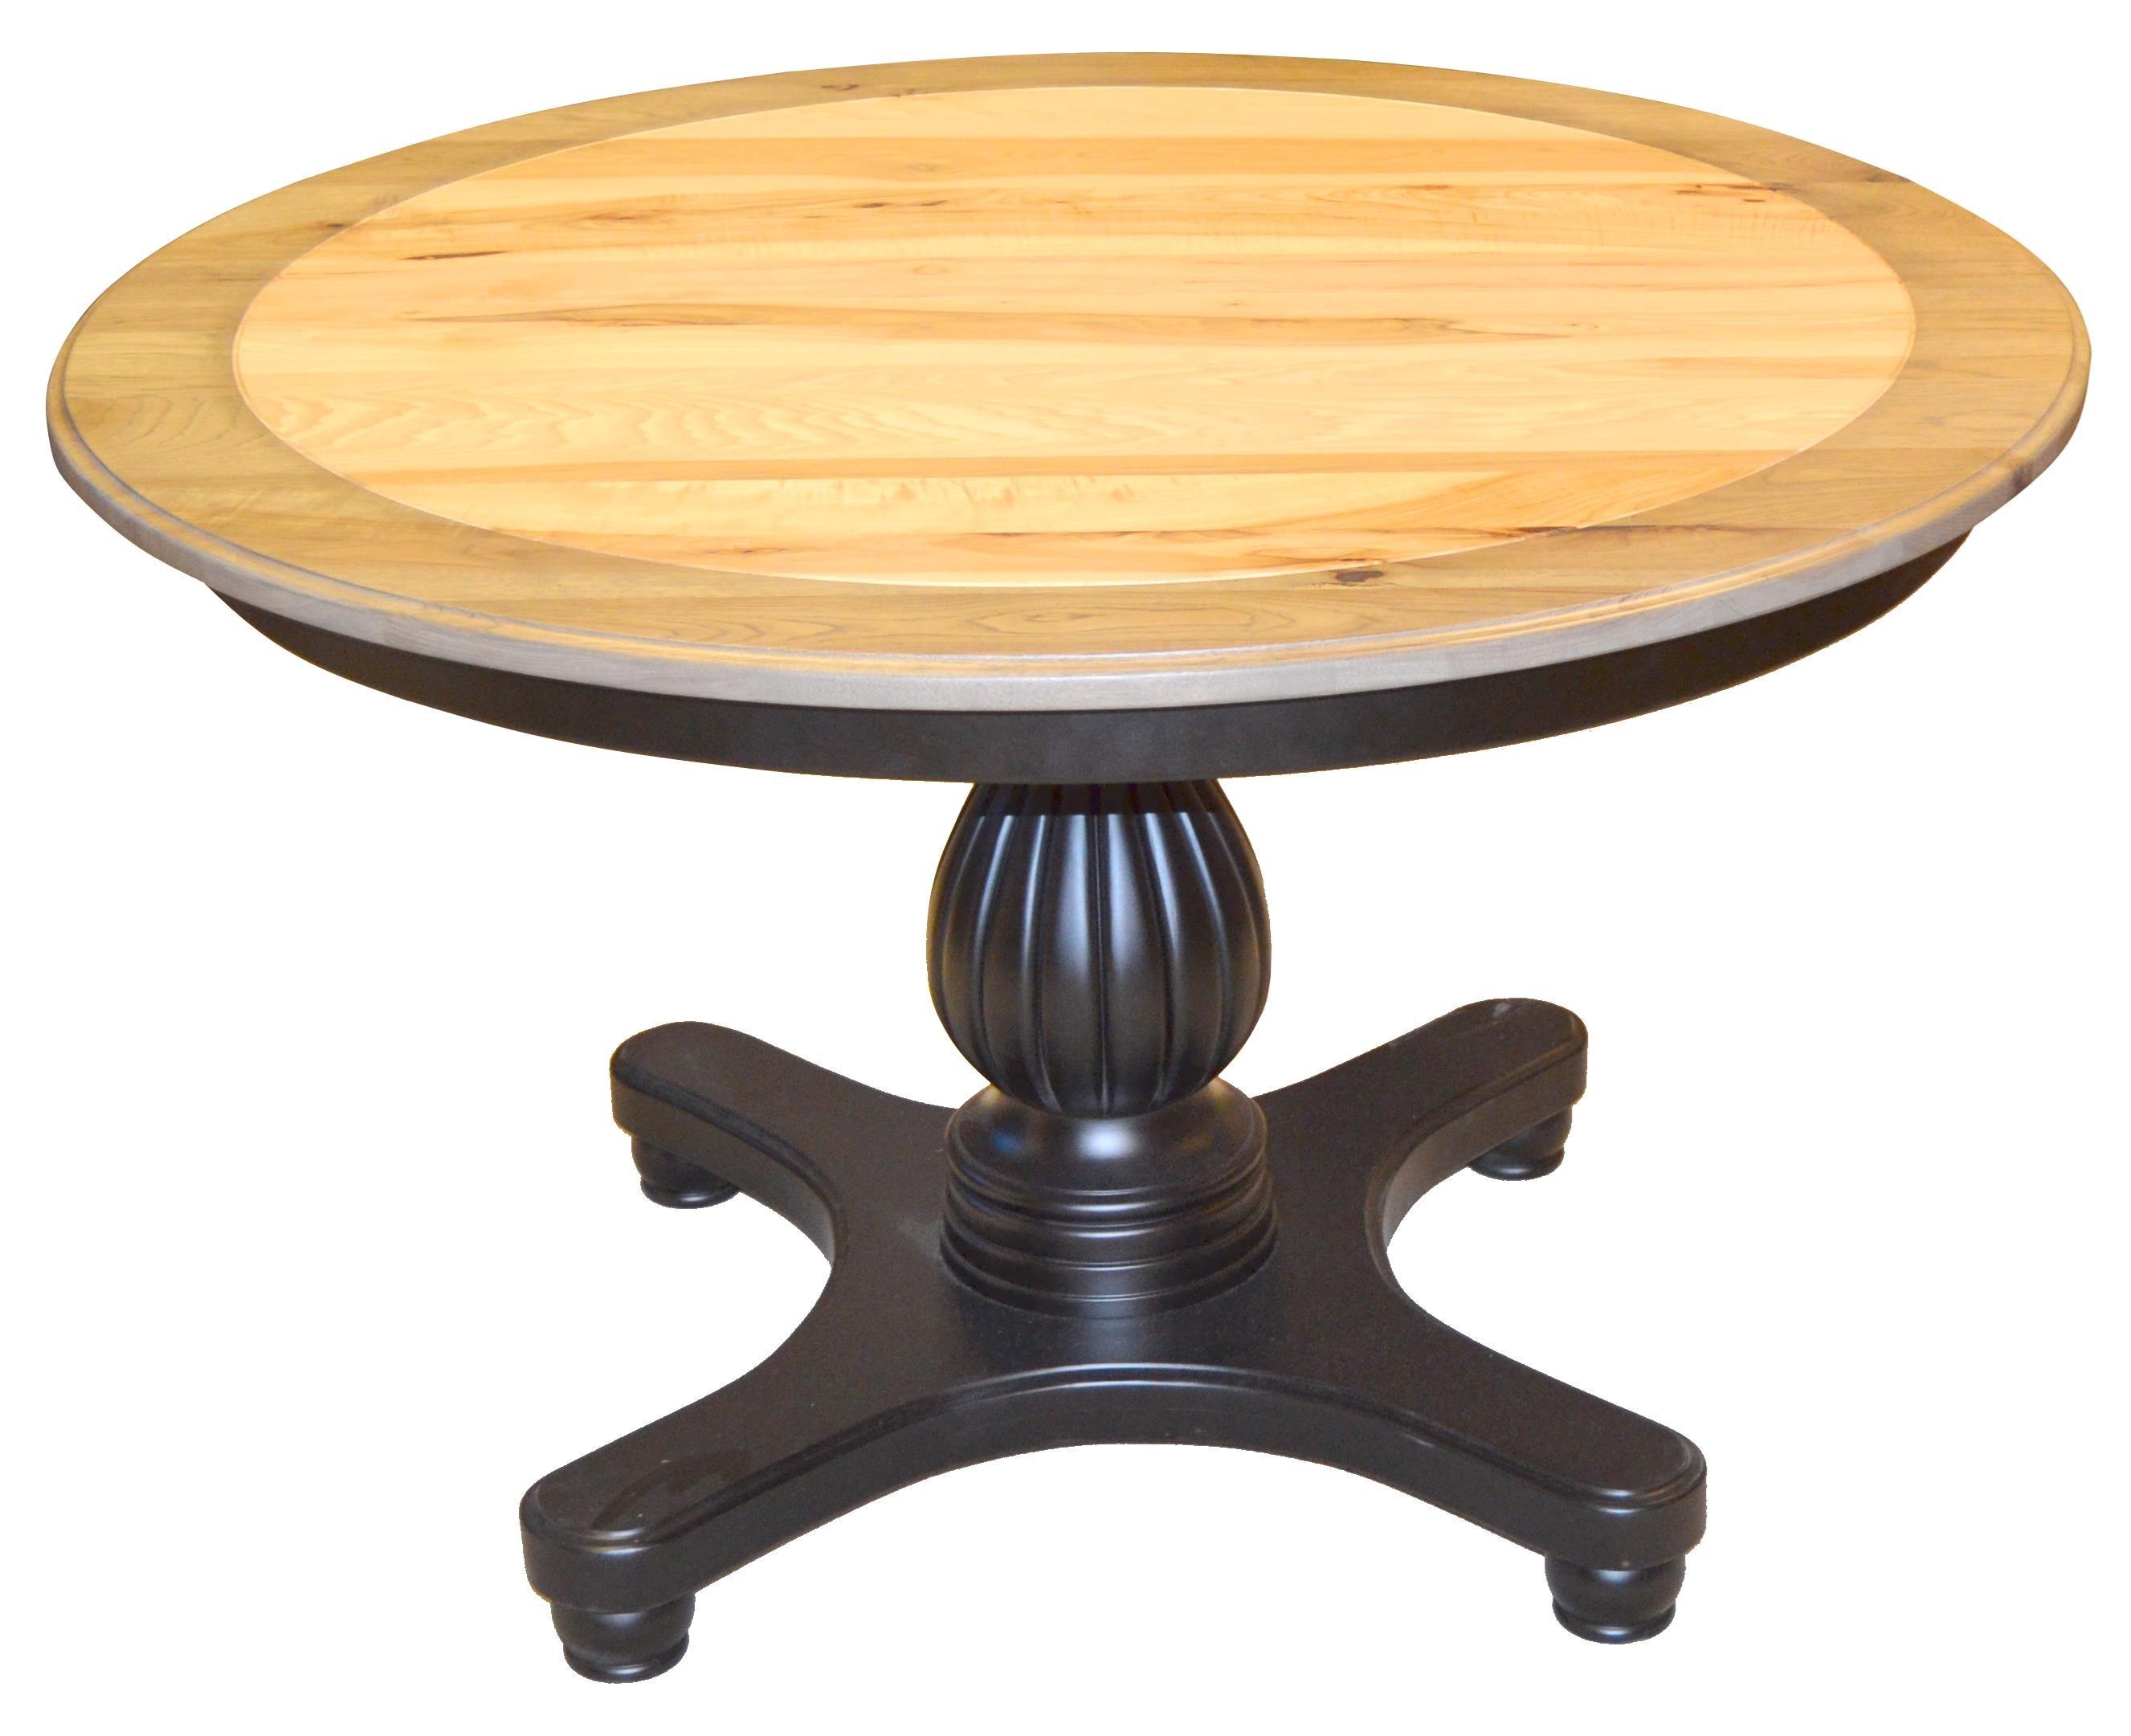 Kountry Knob Provence Single Pedestal Table by Wayside Custom Furniture at Wayside Furniture